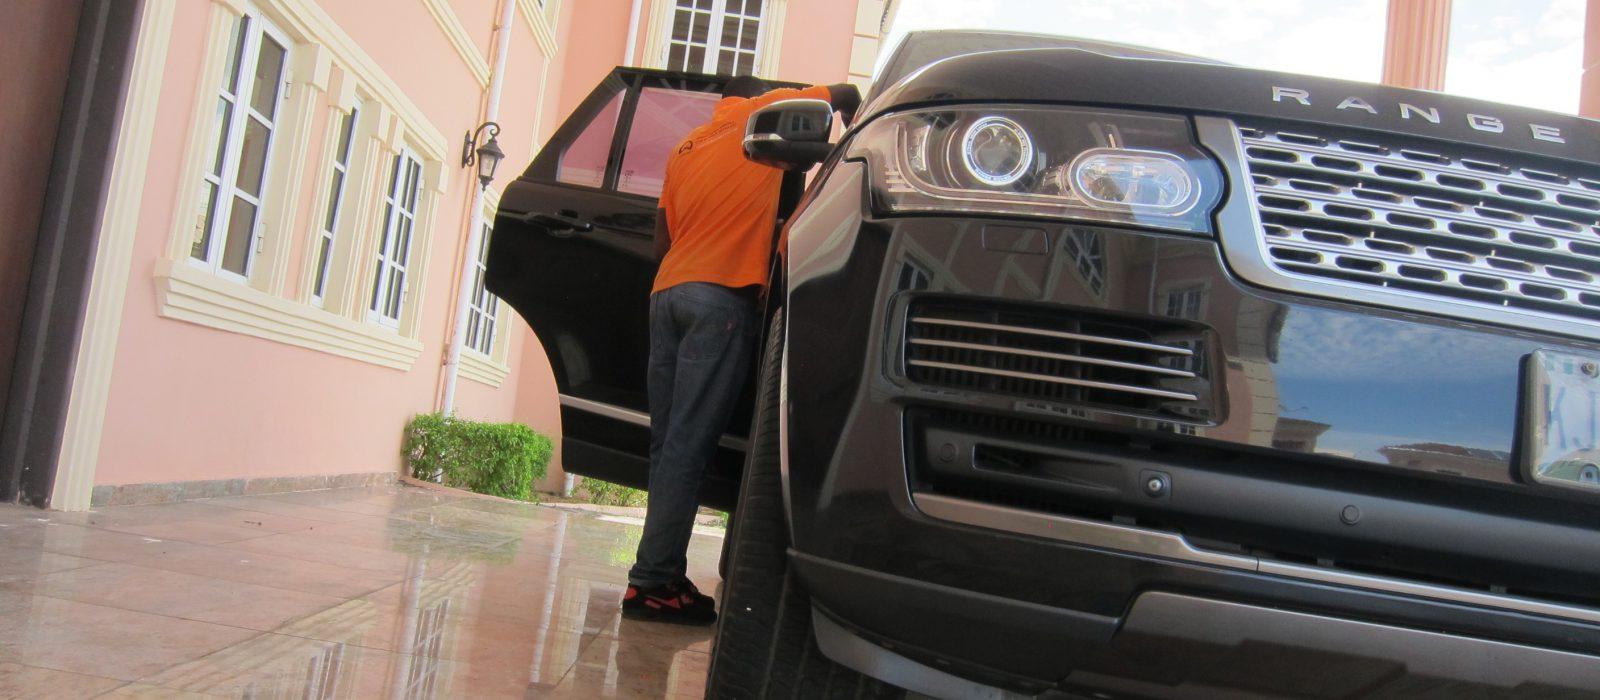 range rover interior detailing best option in Africa